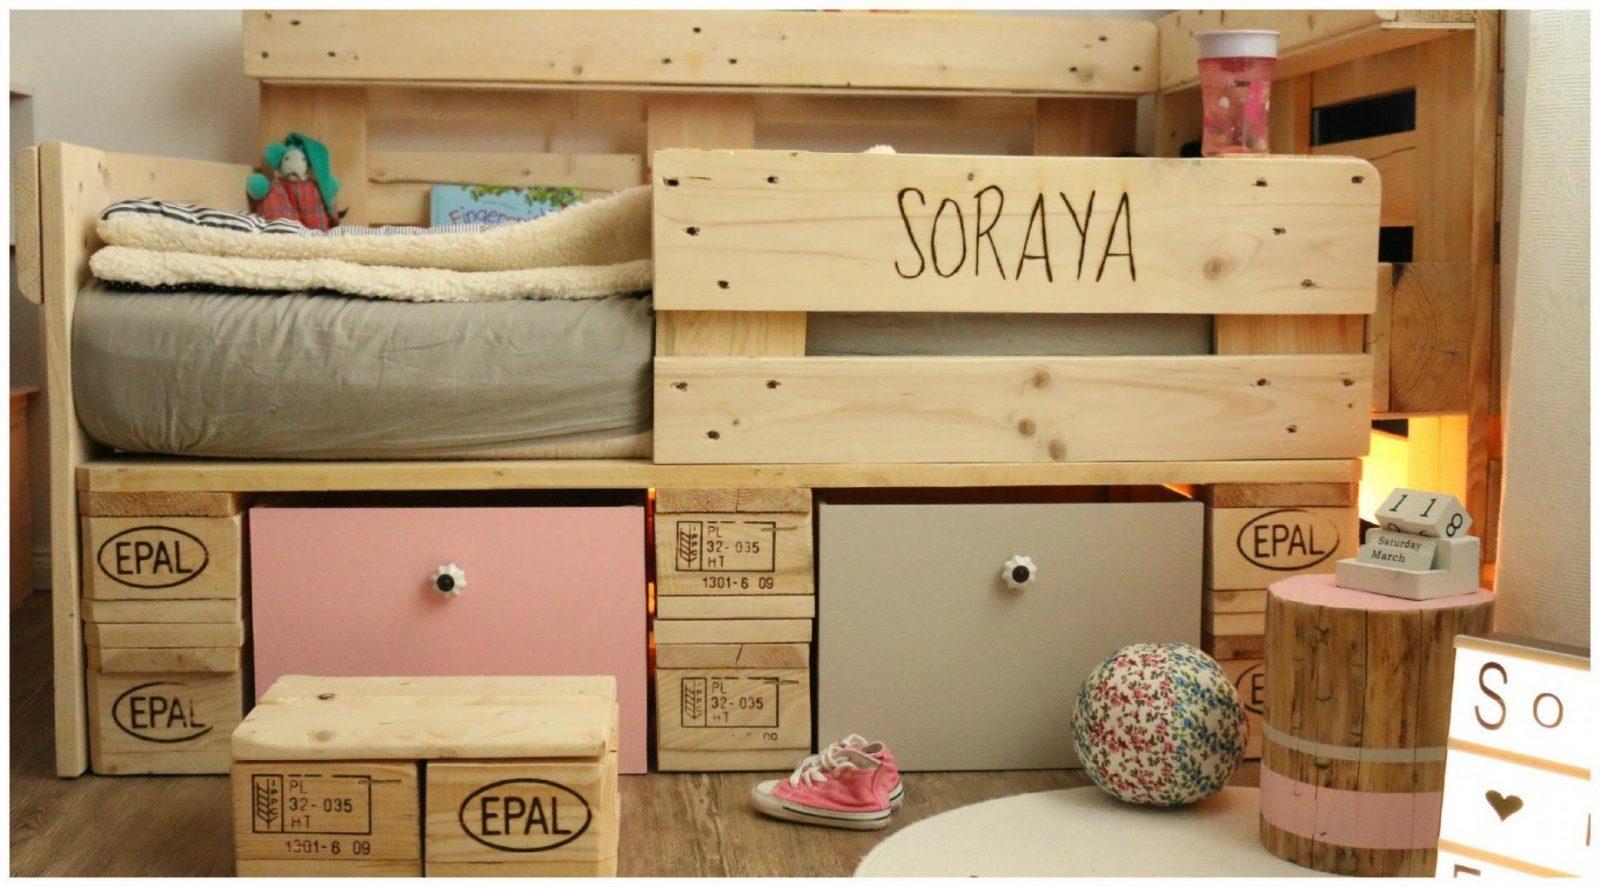 Spektakulare Ideen Kinderbett Und Beste Kinderzimmer Diy Deko Selber